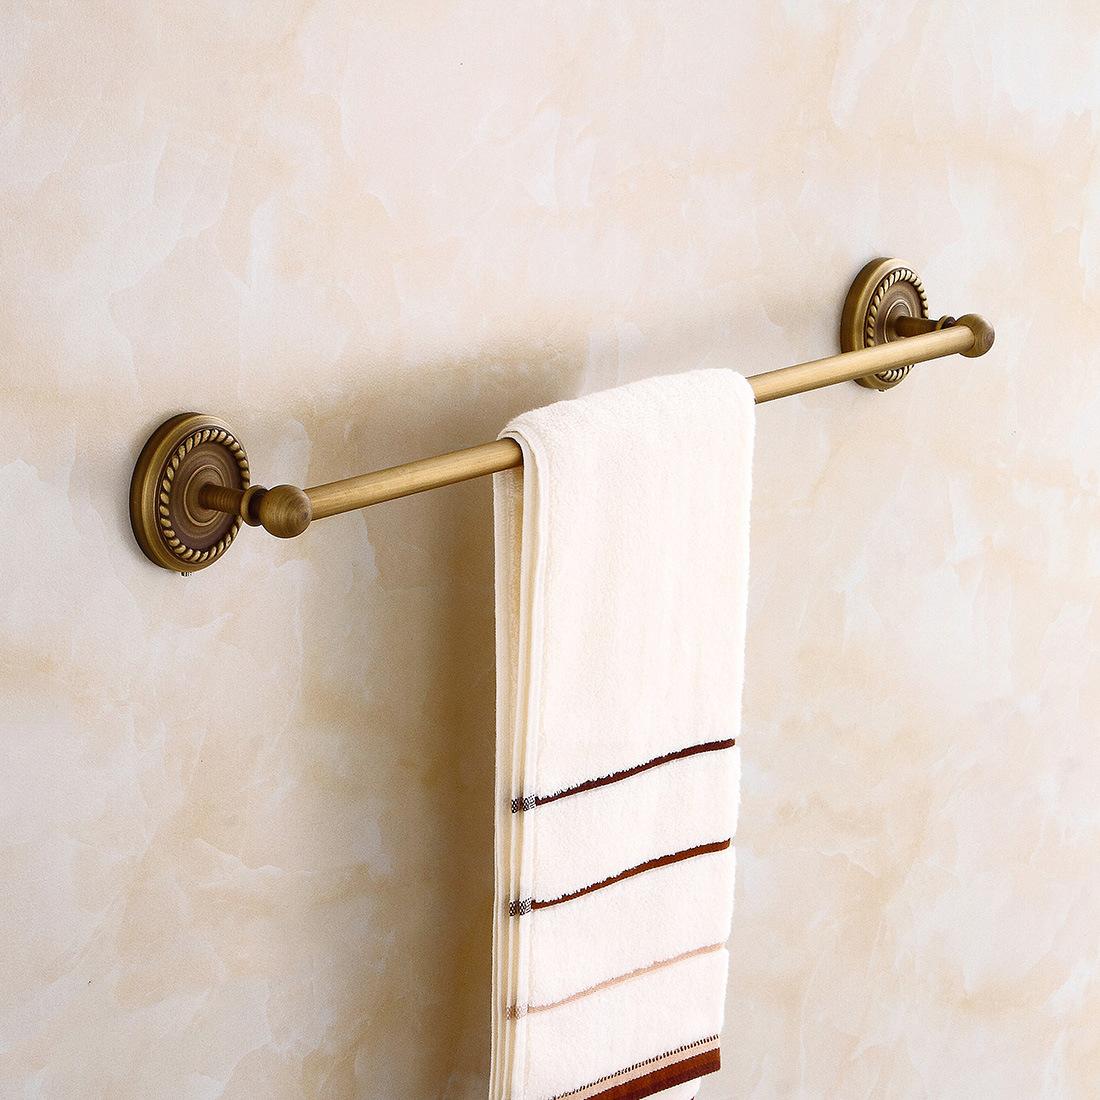 Flg Antique Bathroom Single Towel Bar Sanitary Ware